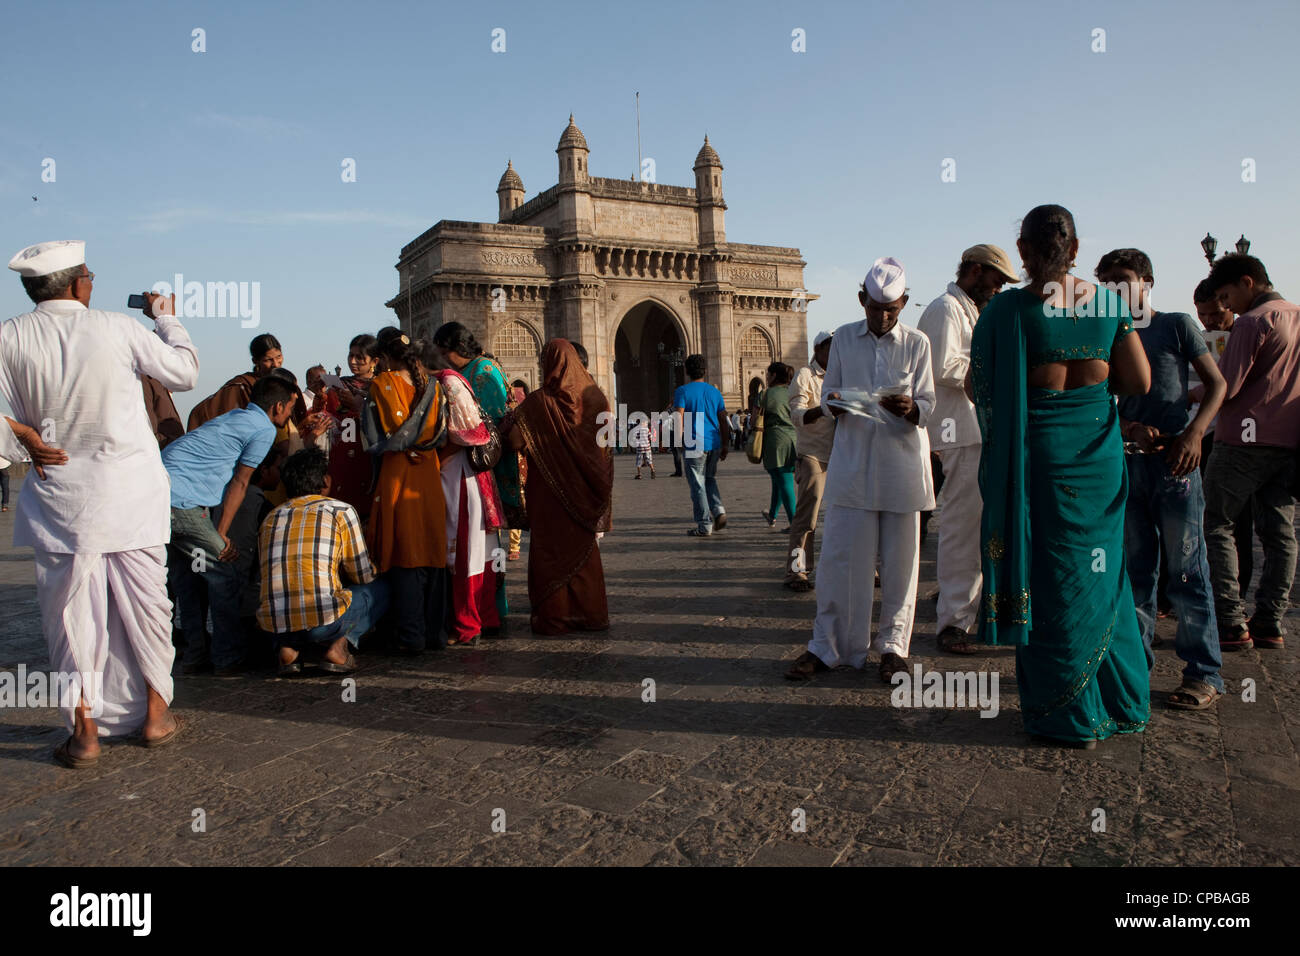 Gateway in India - Mumbai (Bombay) Immagini Stock